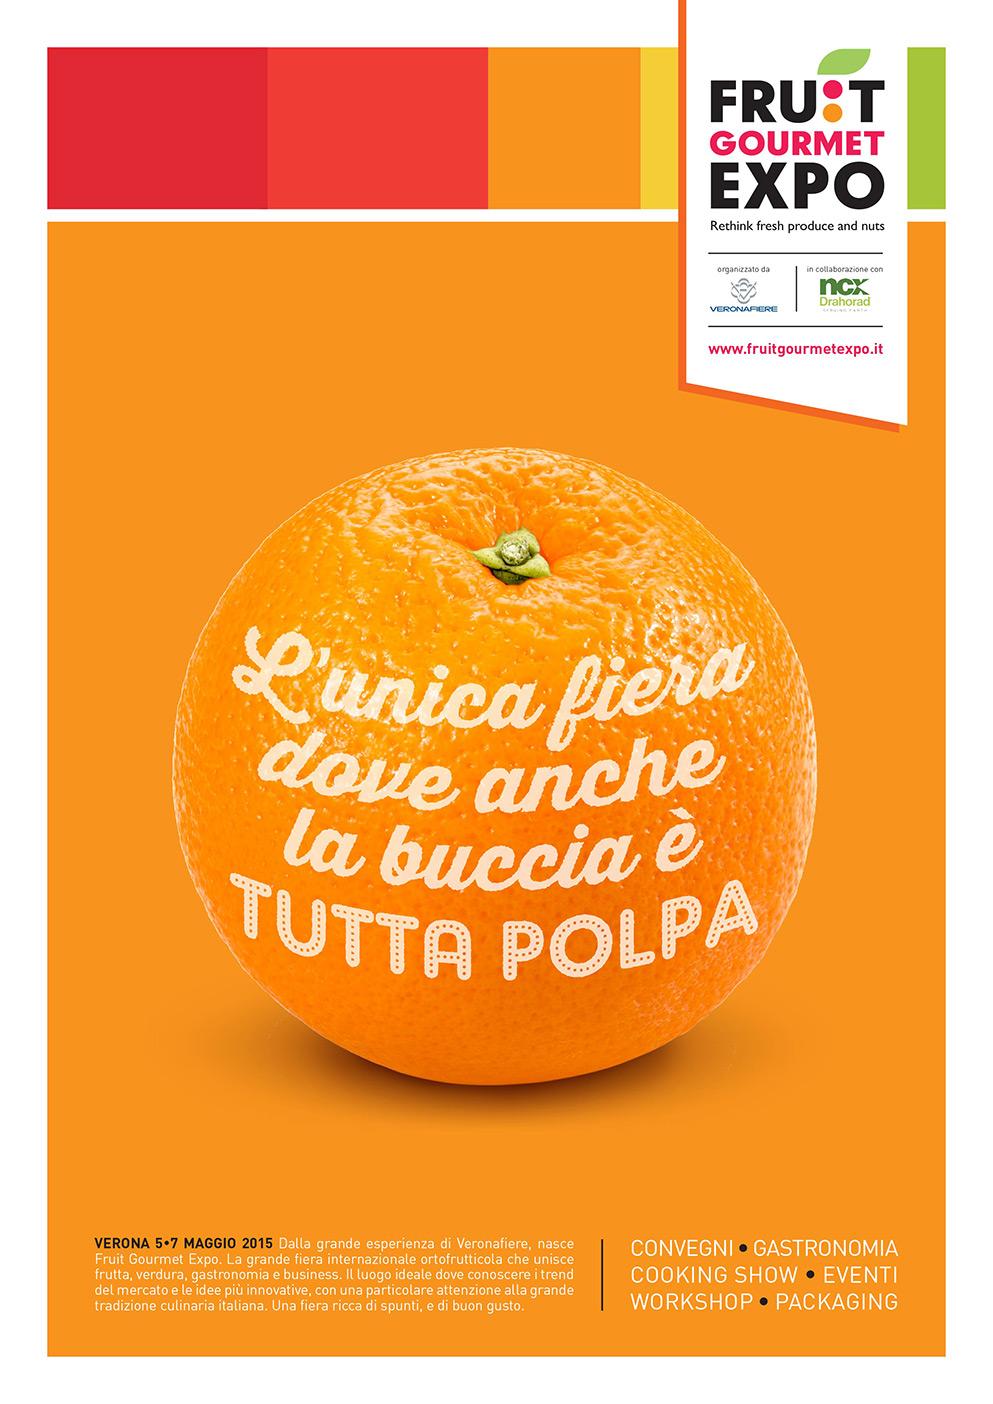 fruit-gourmet-expo-arancia